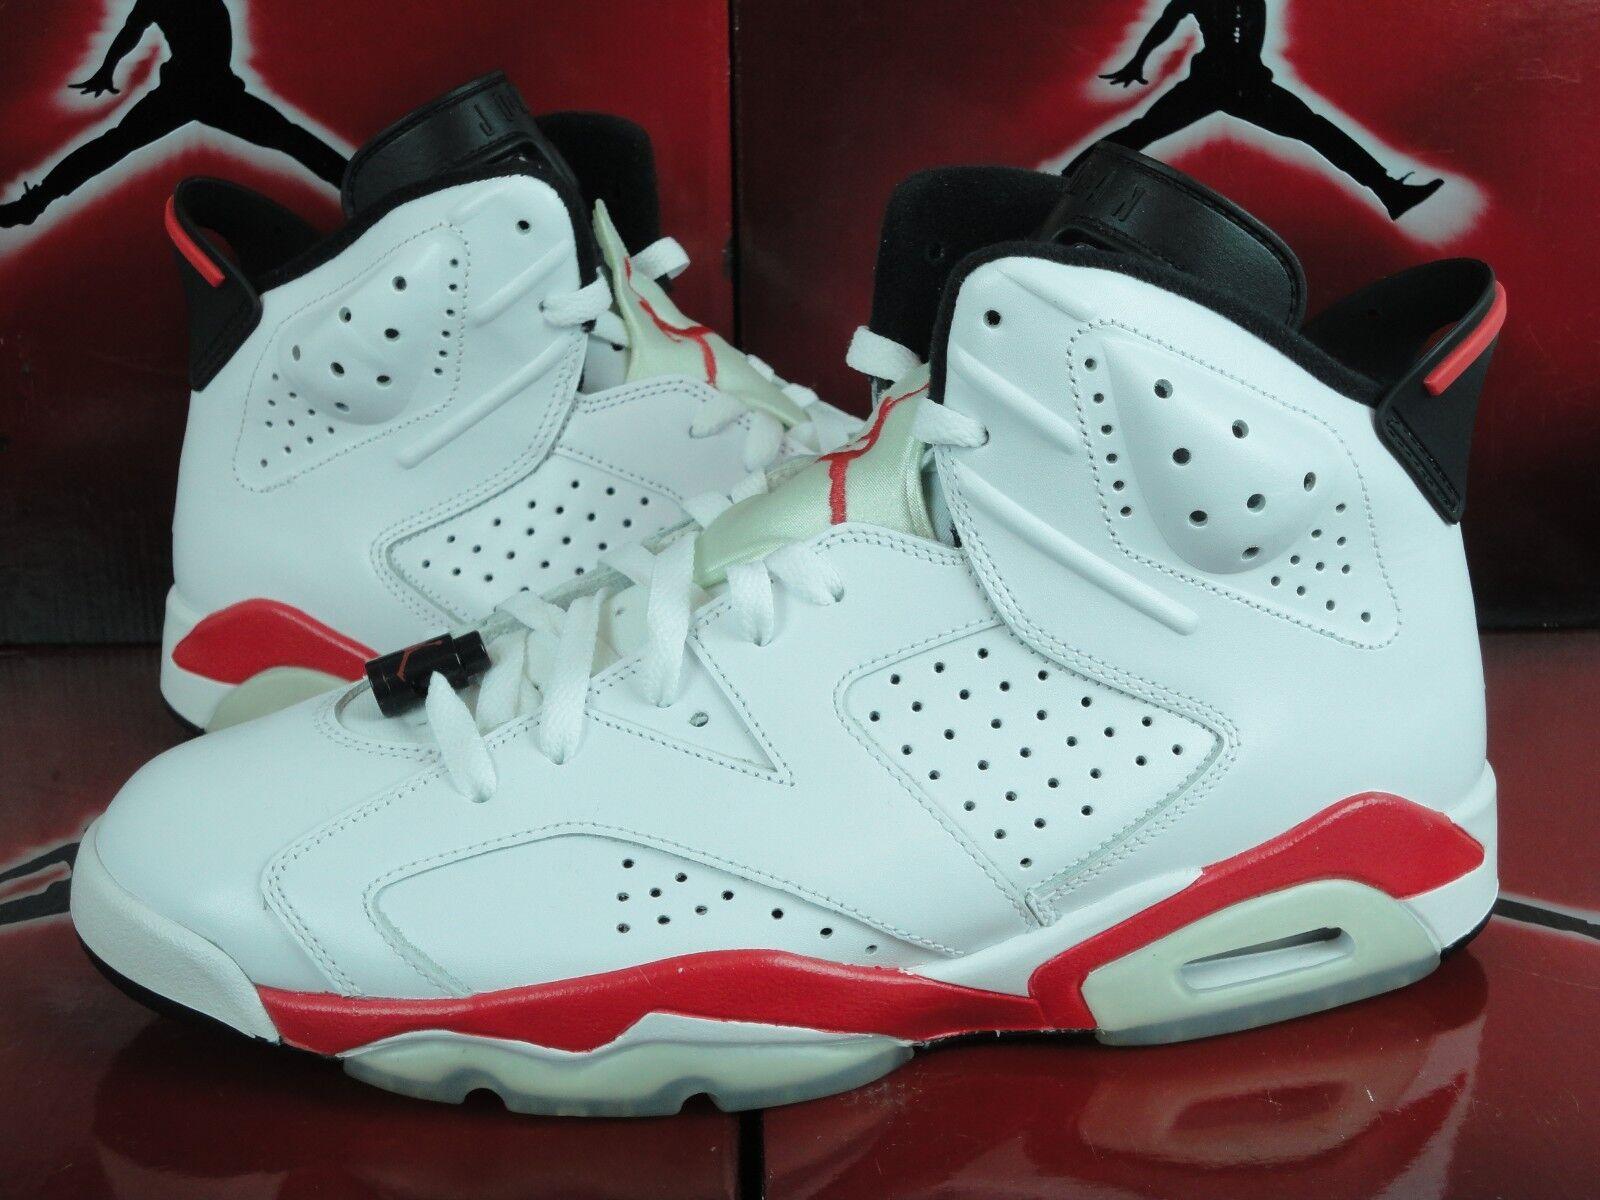 Nike Air Jordan VI 6 Infrared Pack White Pair ONLY Red AJ6 398850-901 Sz 11